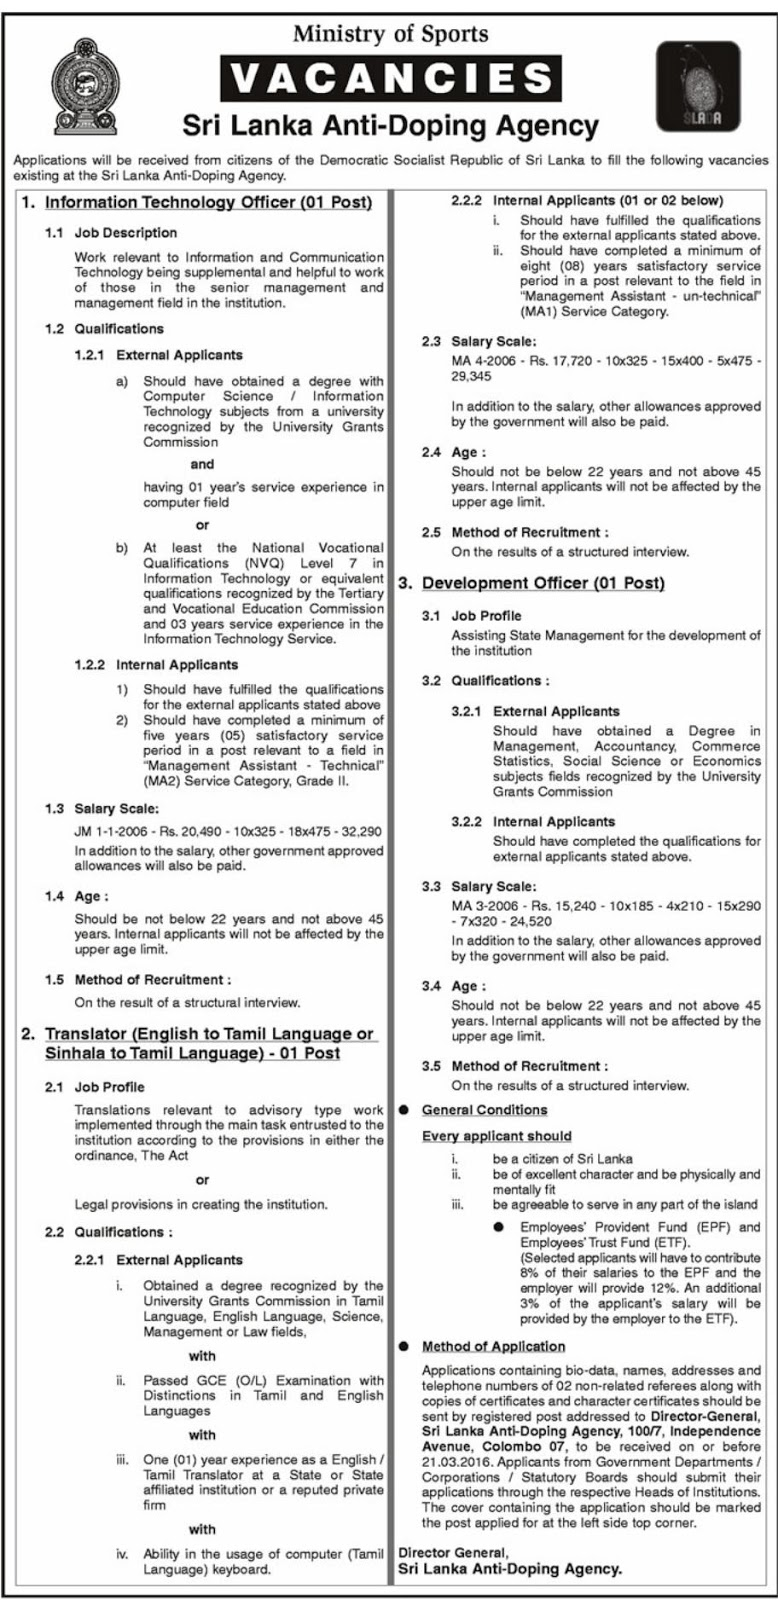 sri lanka telecom mobitel information technology essay View akila athapaththu's profile on linkedin mobitel (pvt) ltd, sri lanka telecom, zte lanka pvt ltd faculty of information technology.